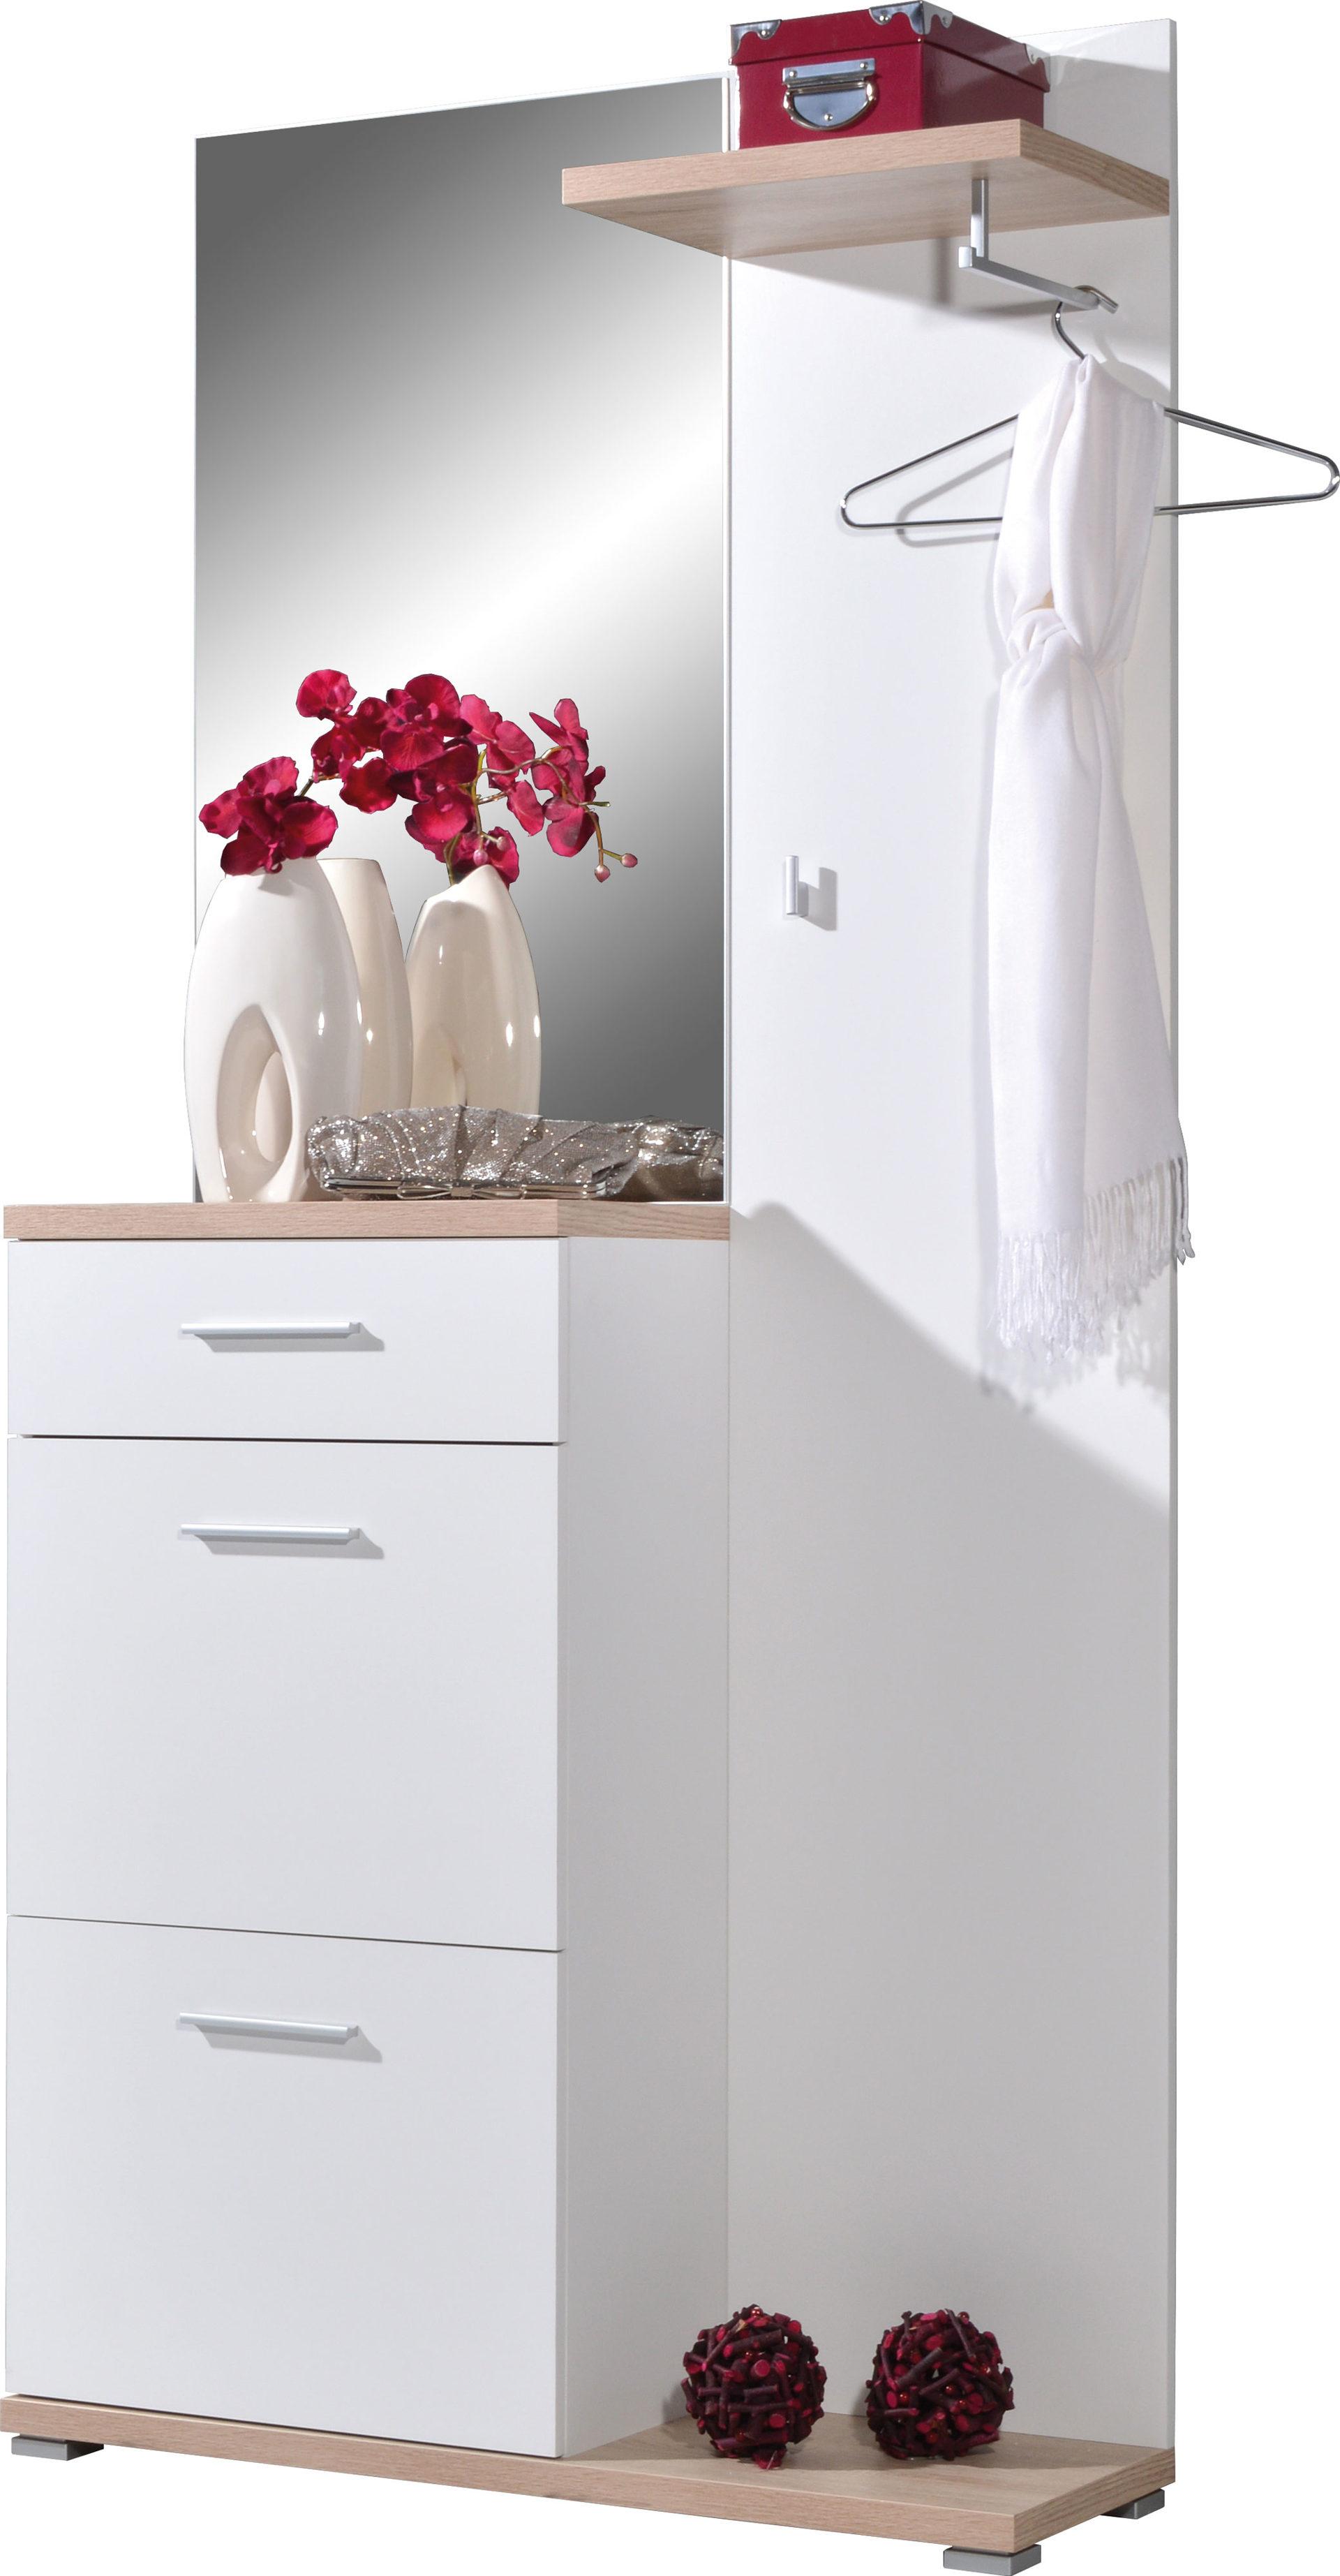 Kompakt Garderobe Inklusive Schuhschrank Sonoma Eichefarbene